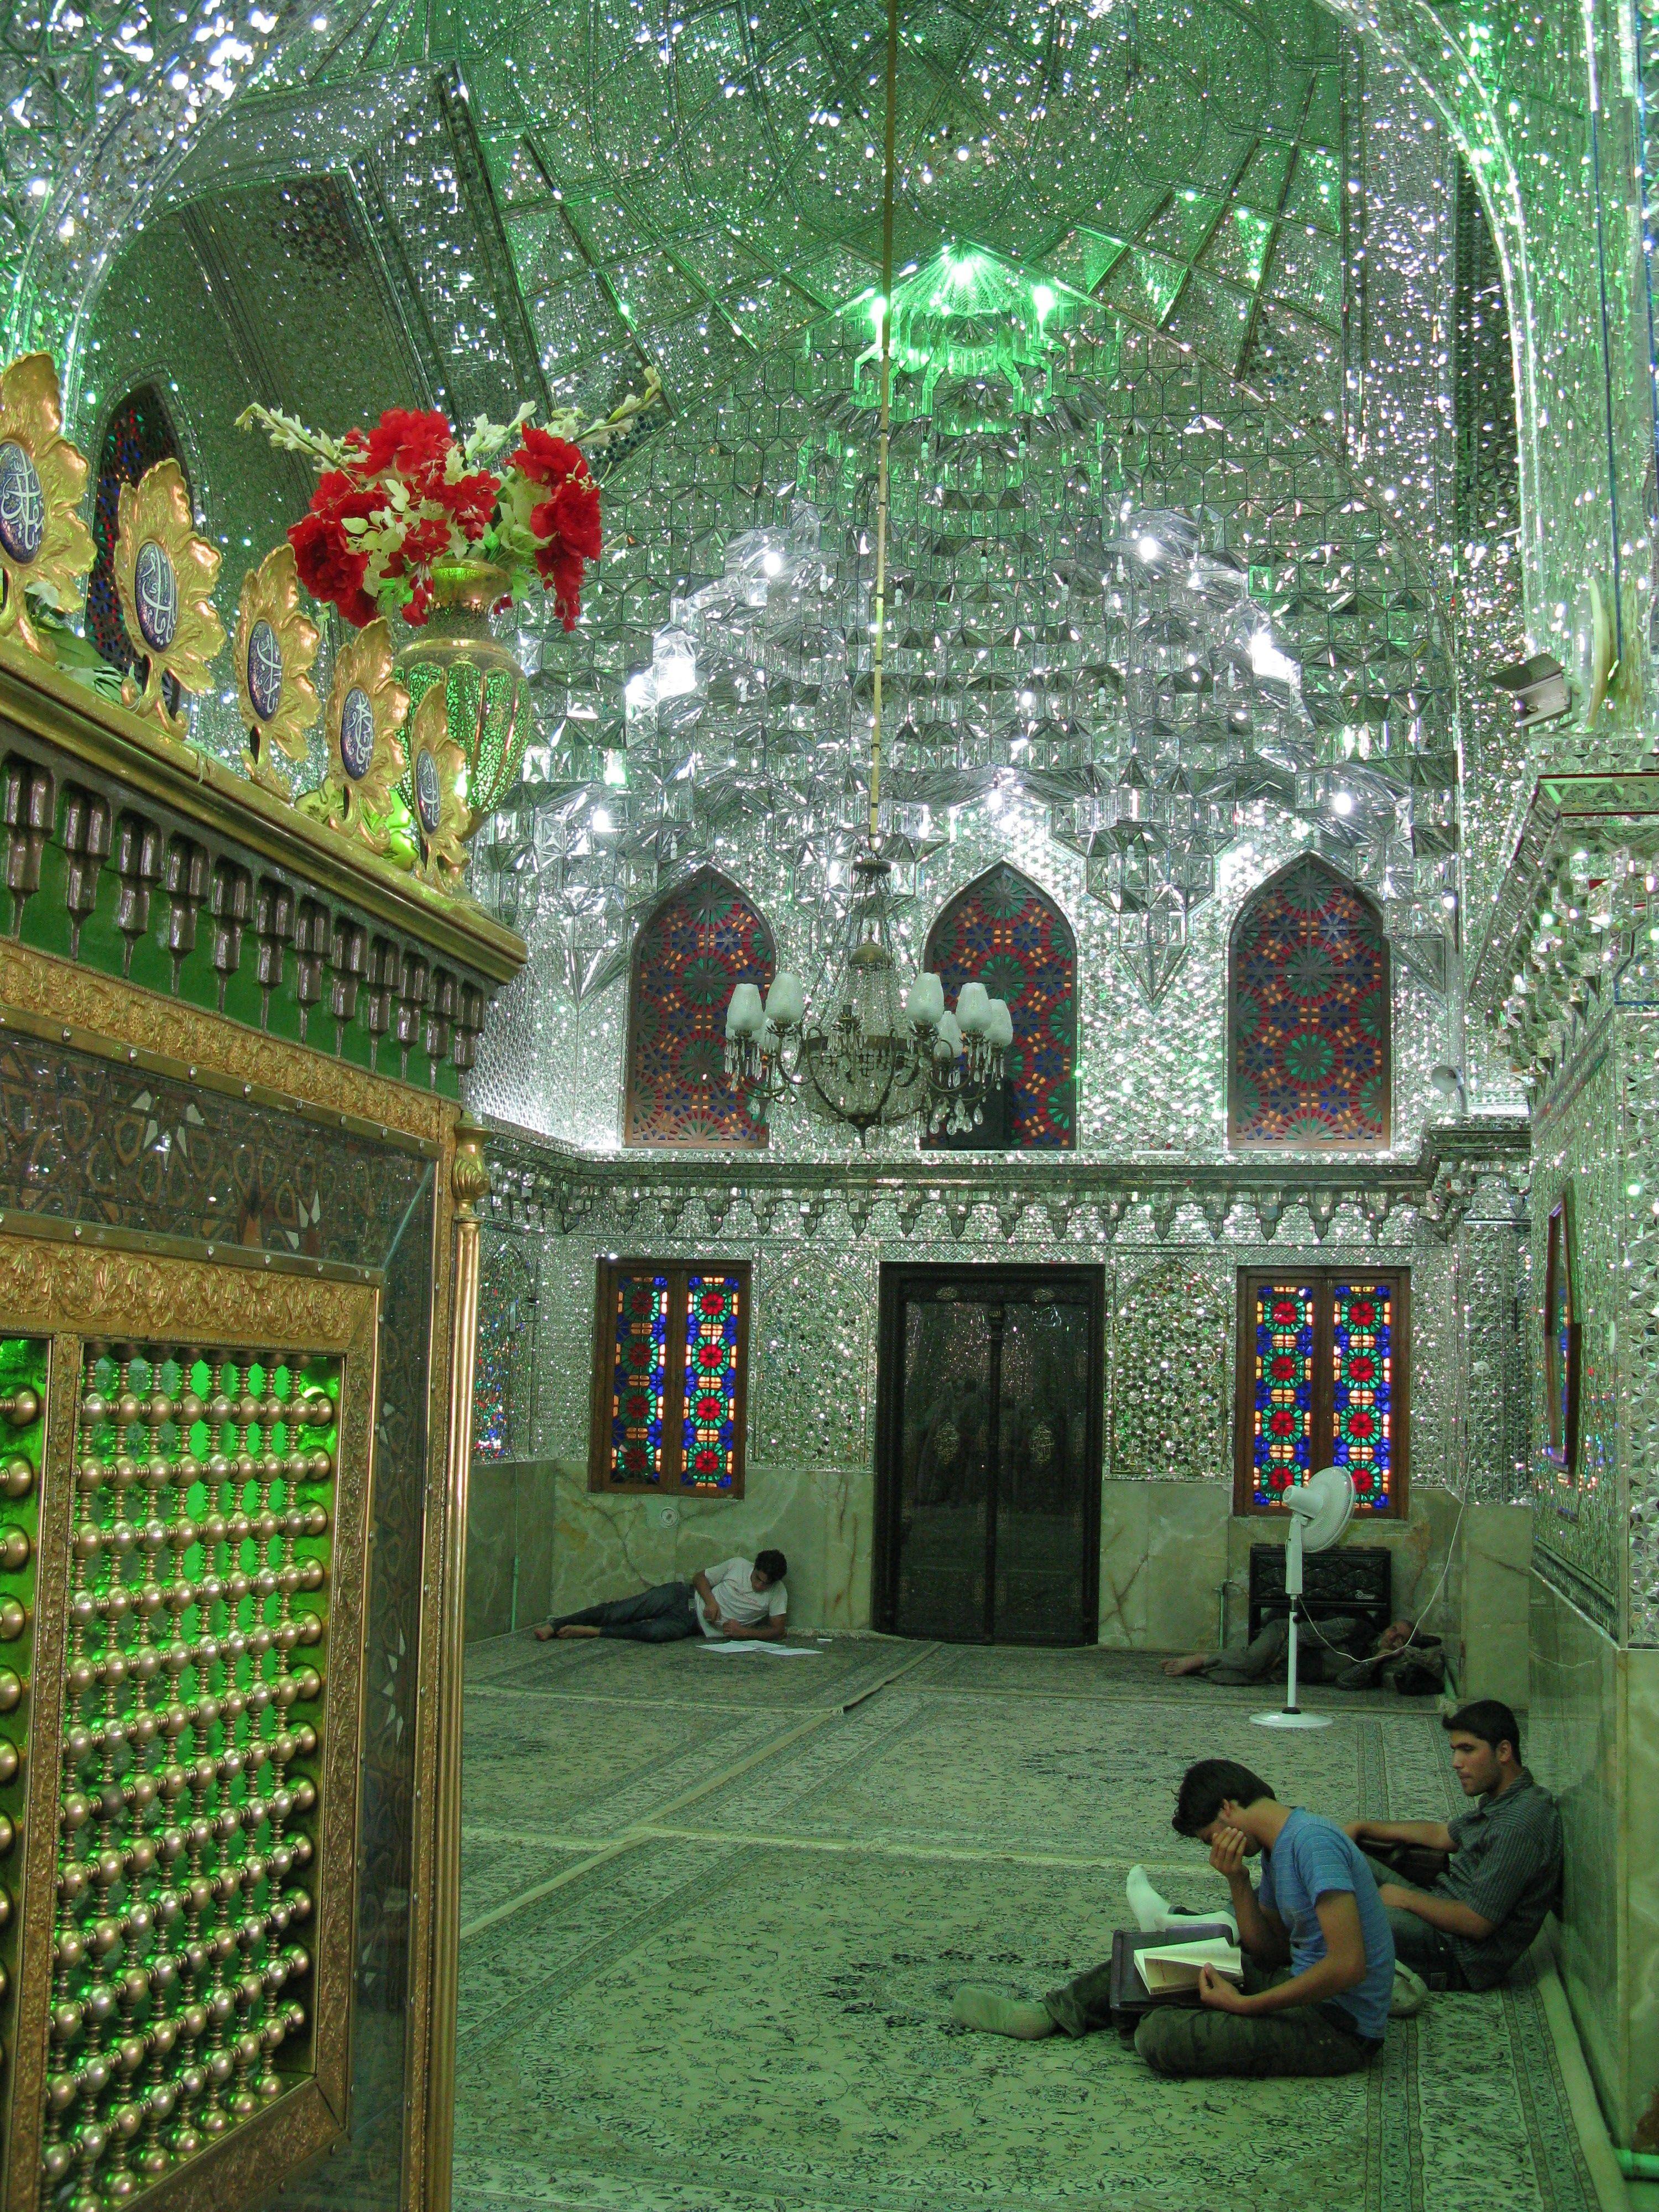 Ali Ibn Hamzah Mausoleum. http://www.farhorizons.com/trips/MiddleEastandArabia/IranEmpires/IranEmpires.php